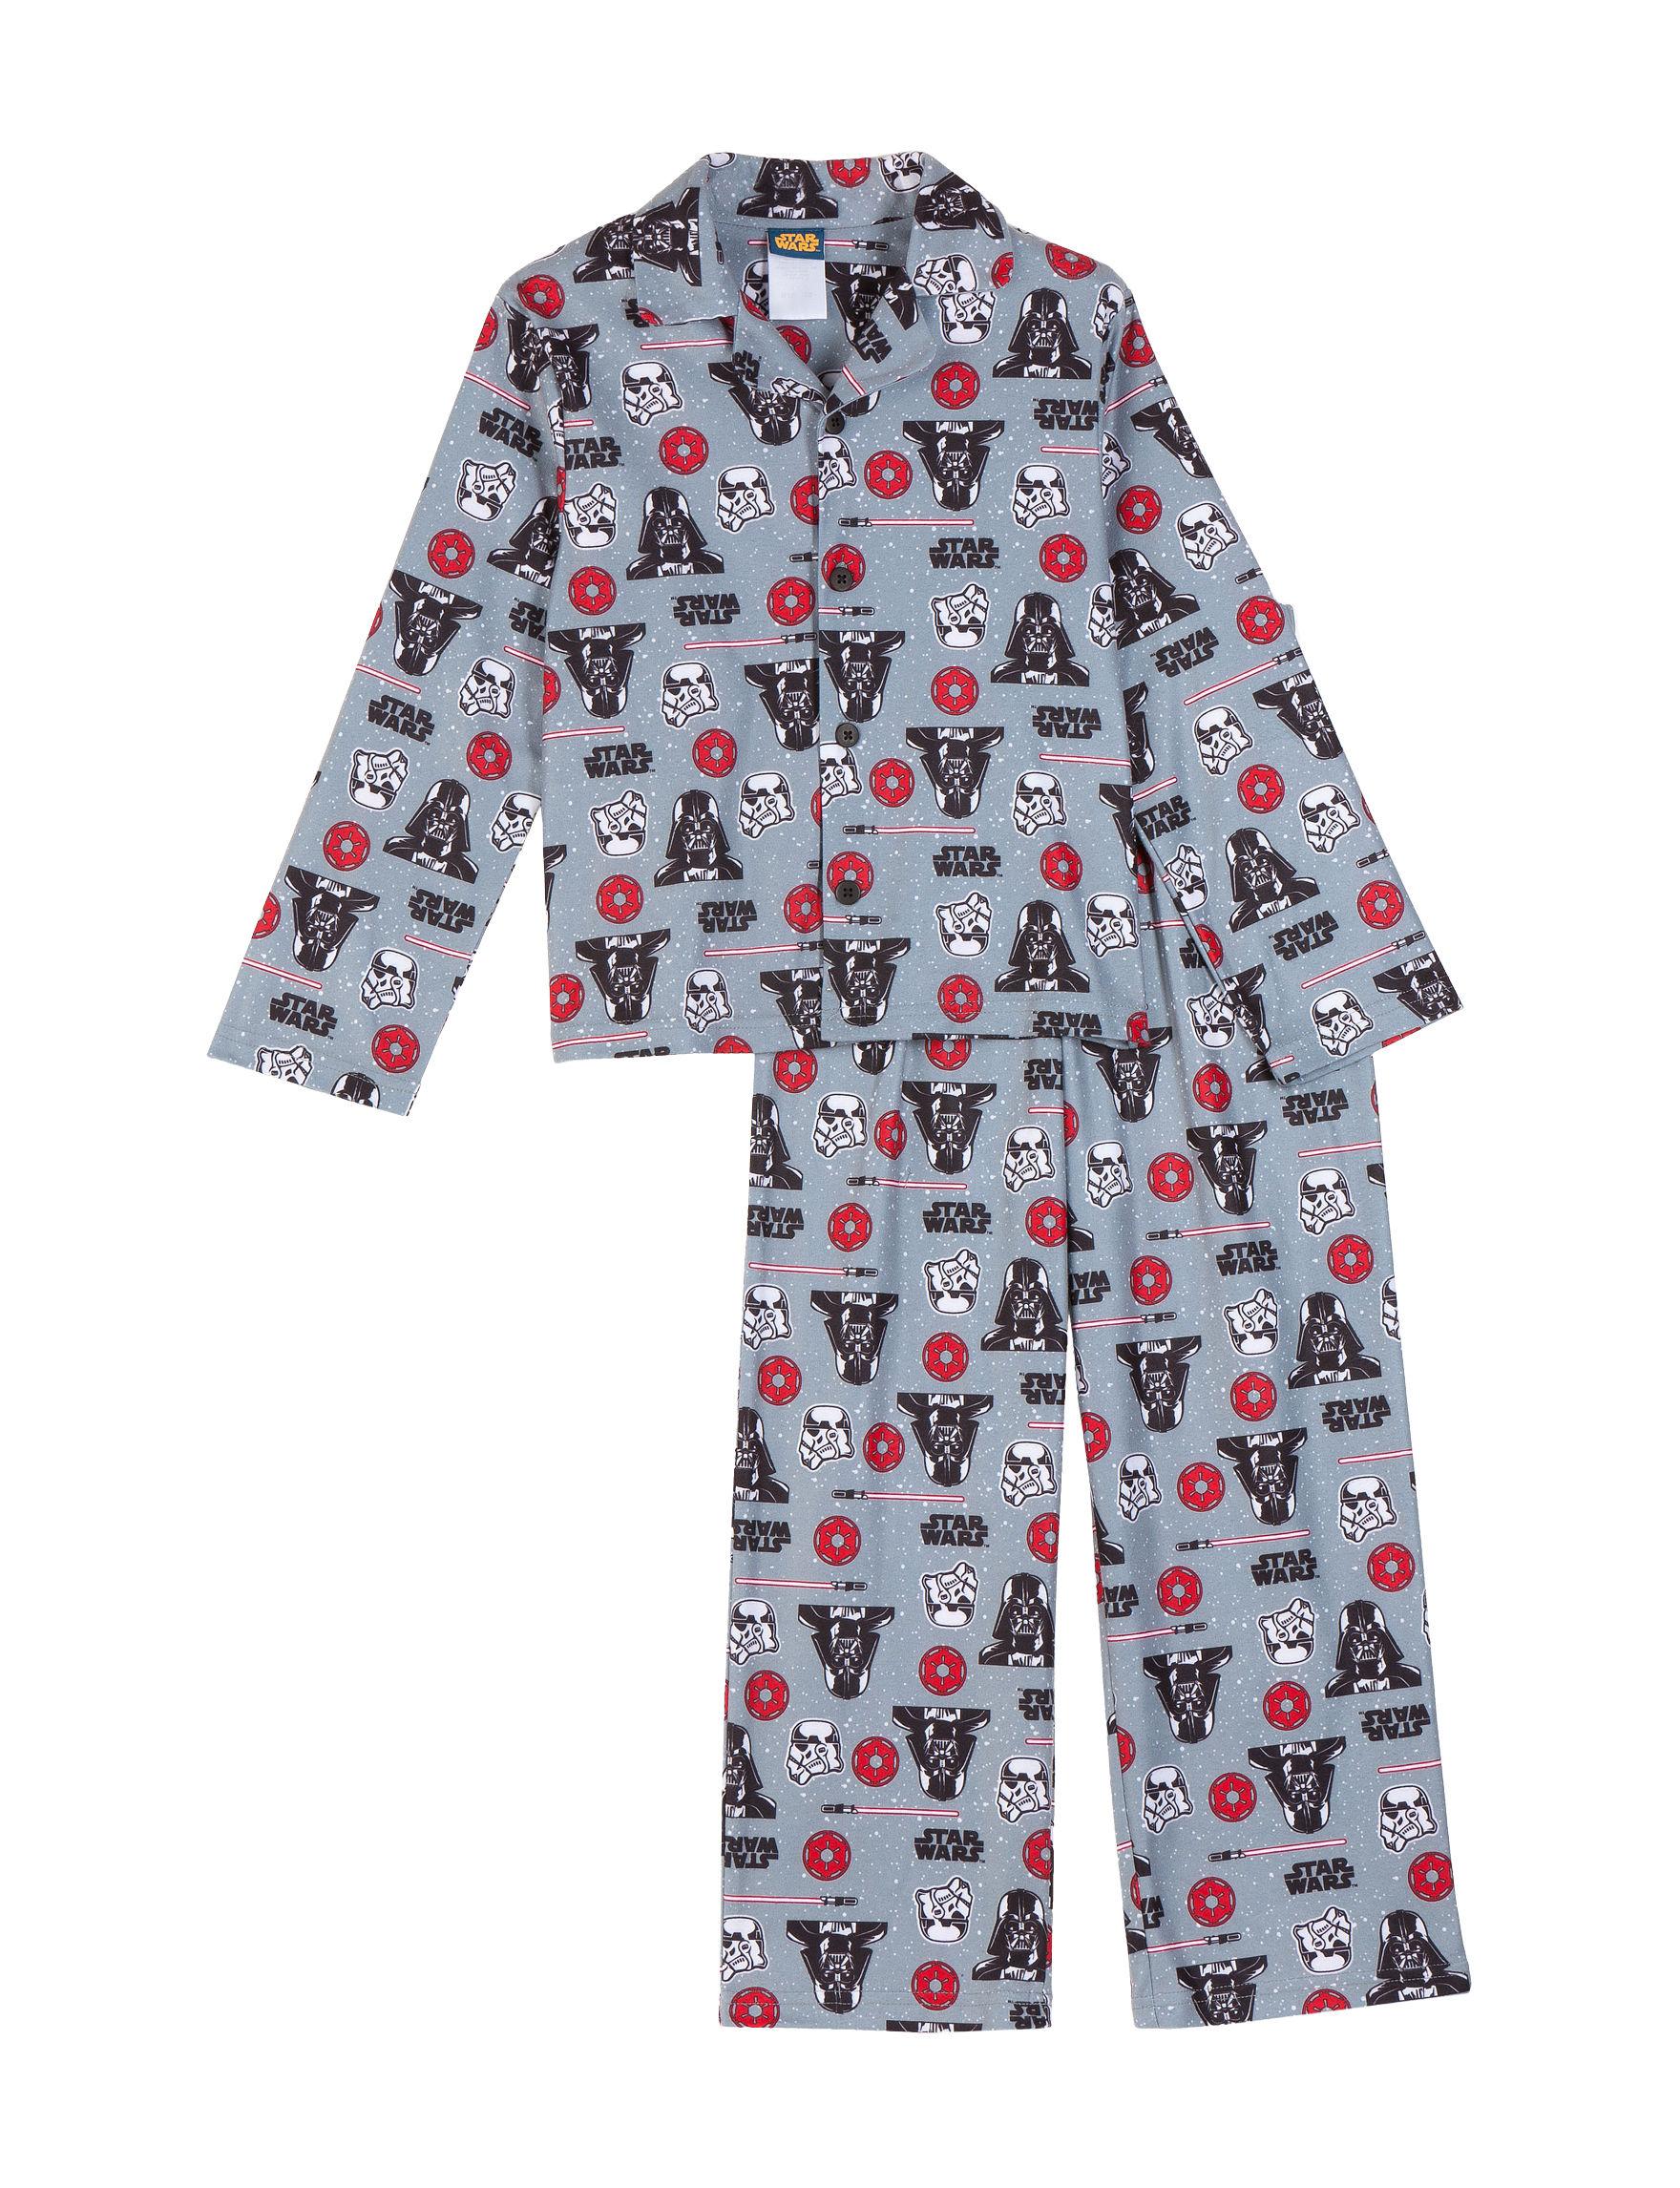 Licensed Grey Pajama Sets